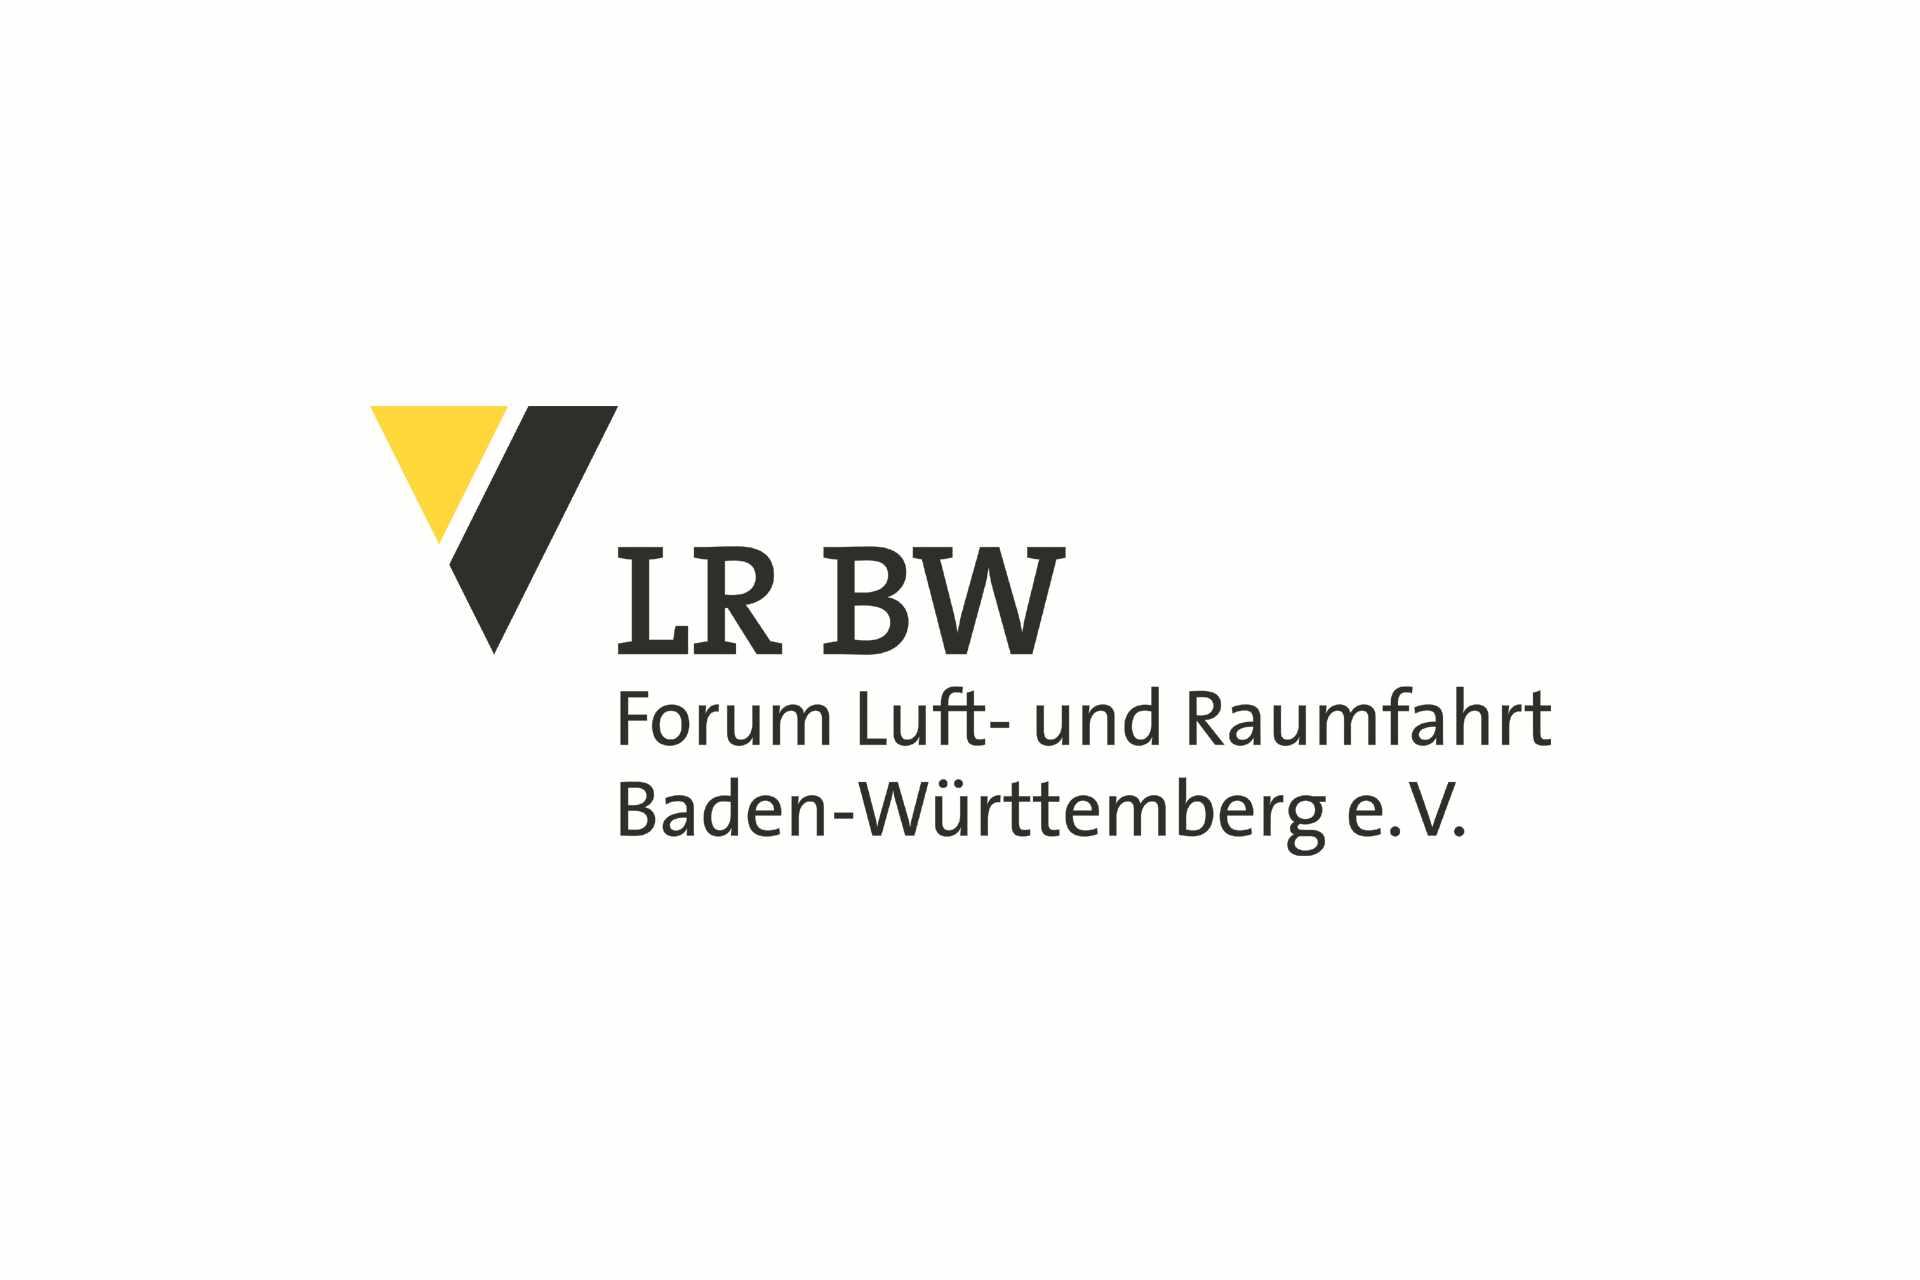 LRBW_Logo2020.png